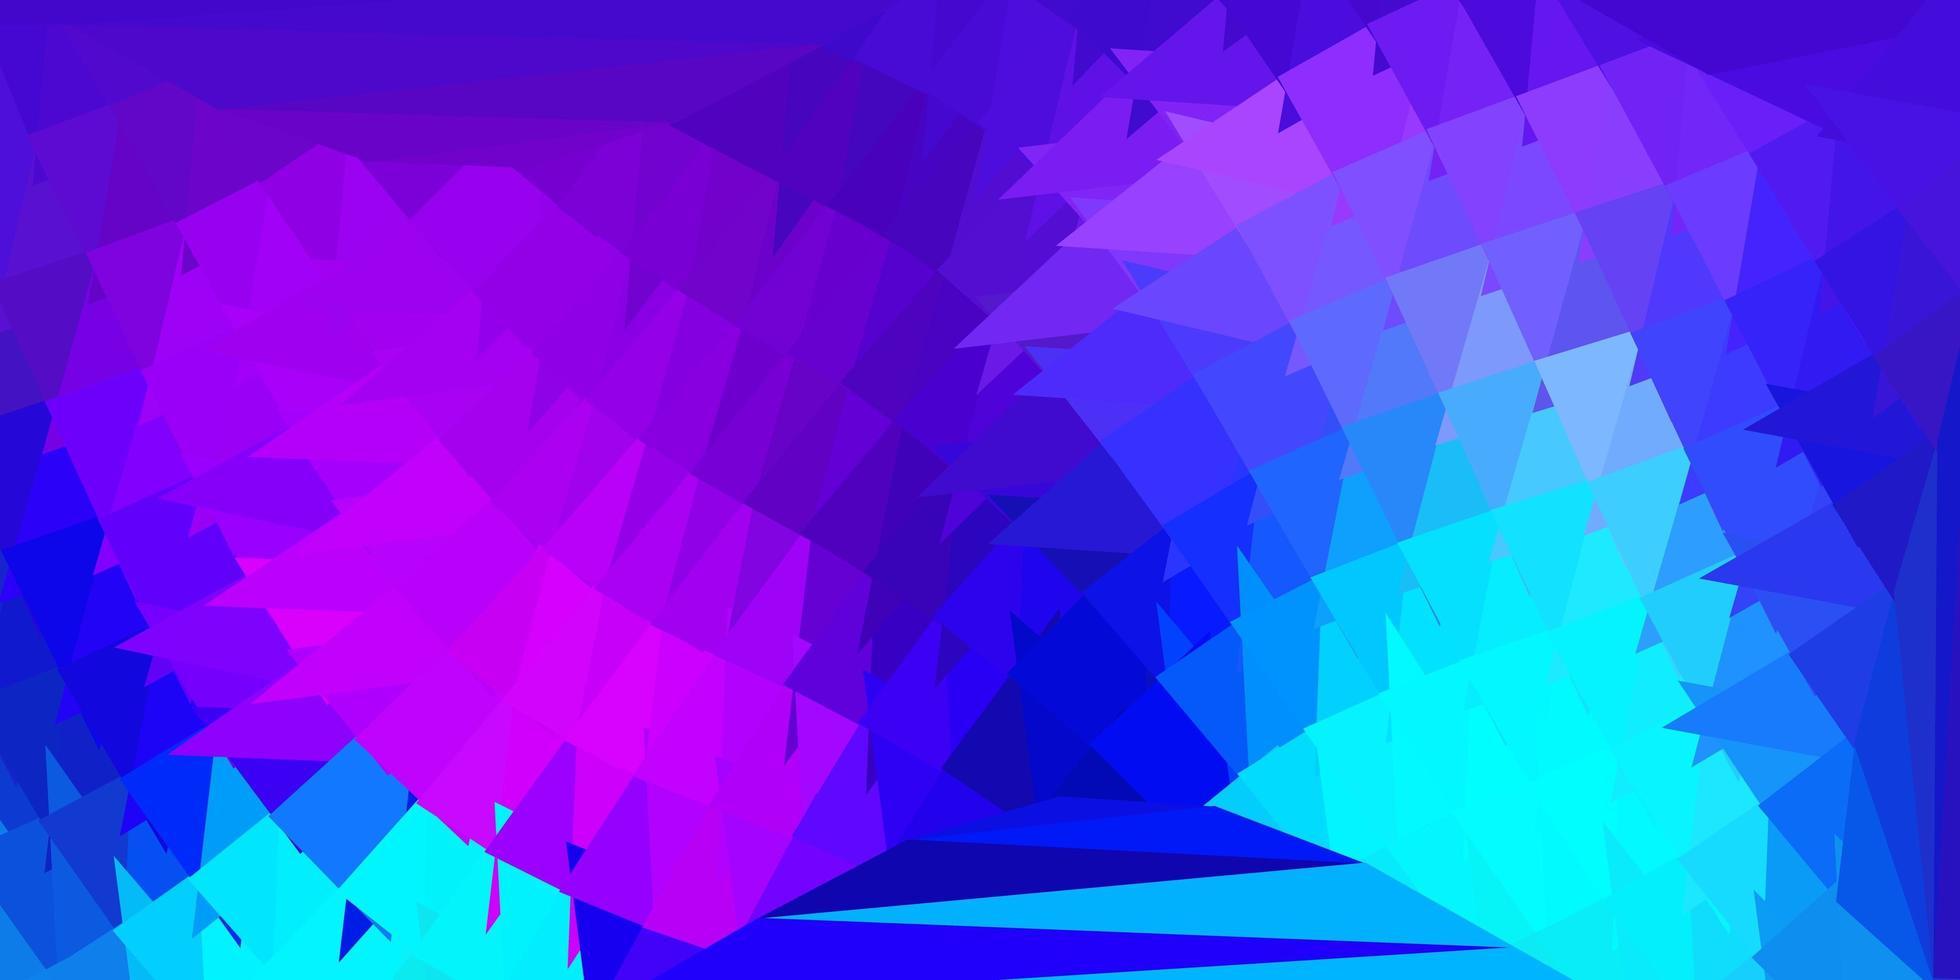 dunkelrosa, blaues Vektorgradienten-Polygon-Design. vektor